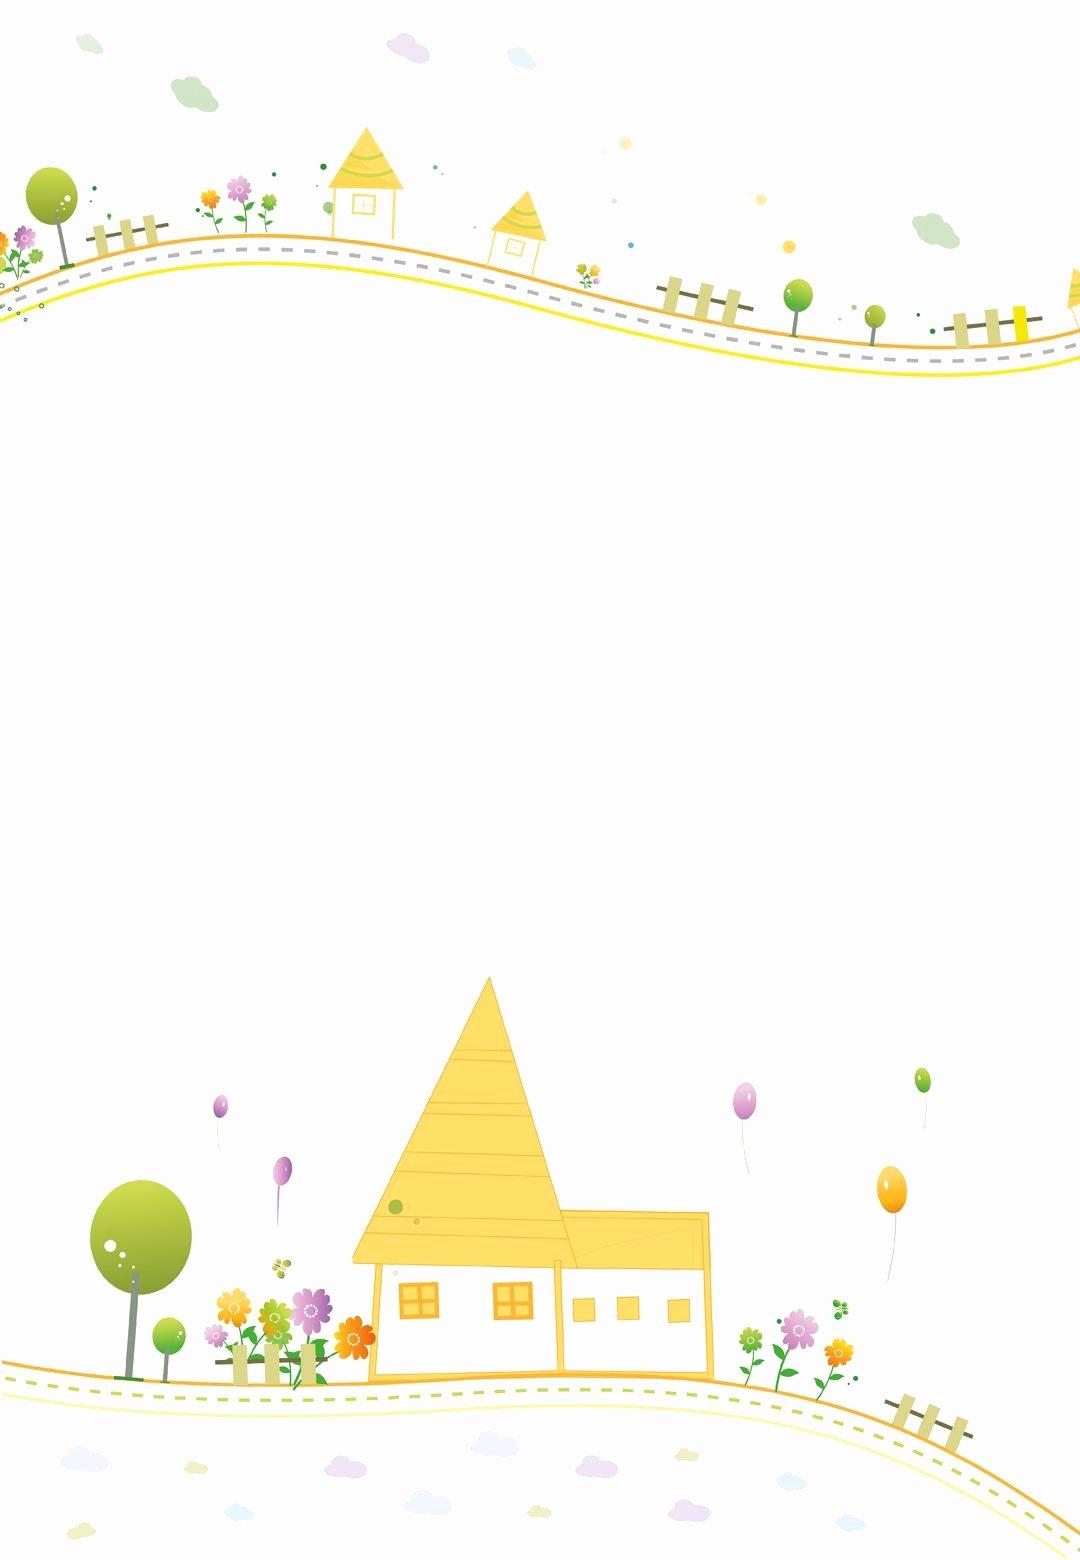 Housewarming Images for Invitation Elegant Housewarming Party Free Printable Housewarming